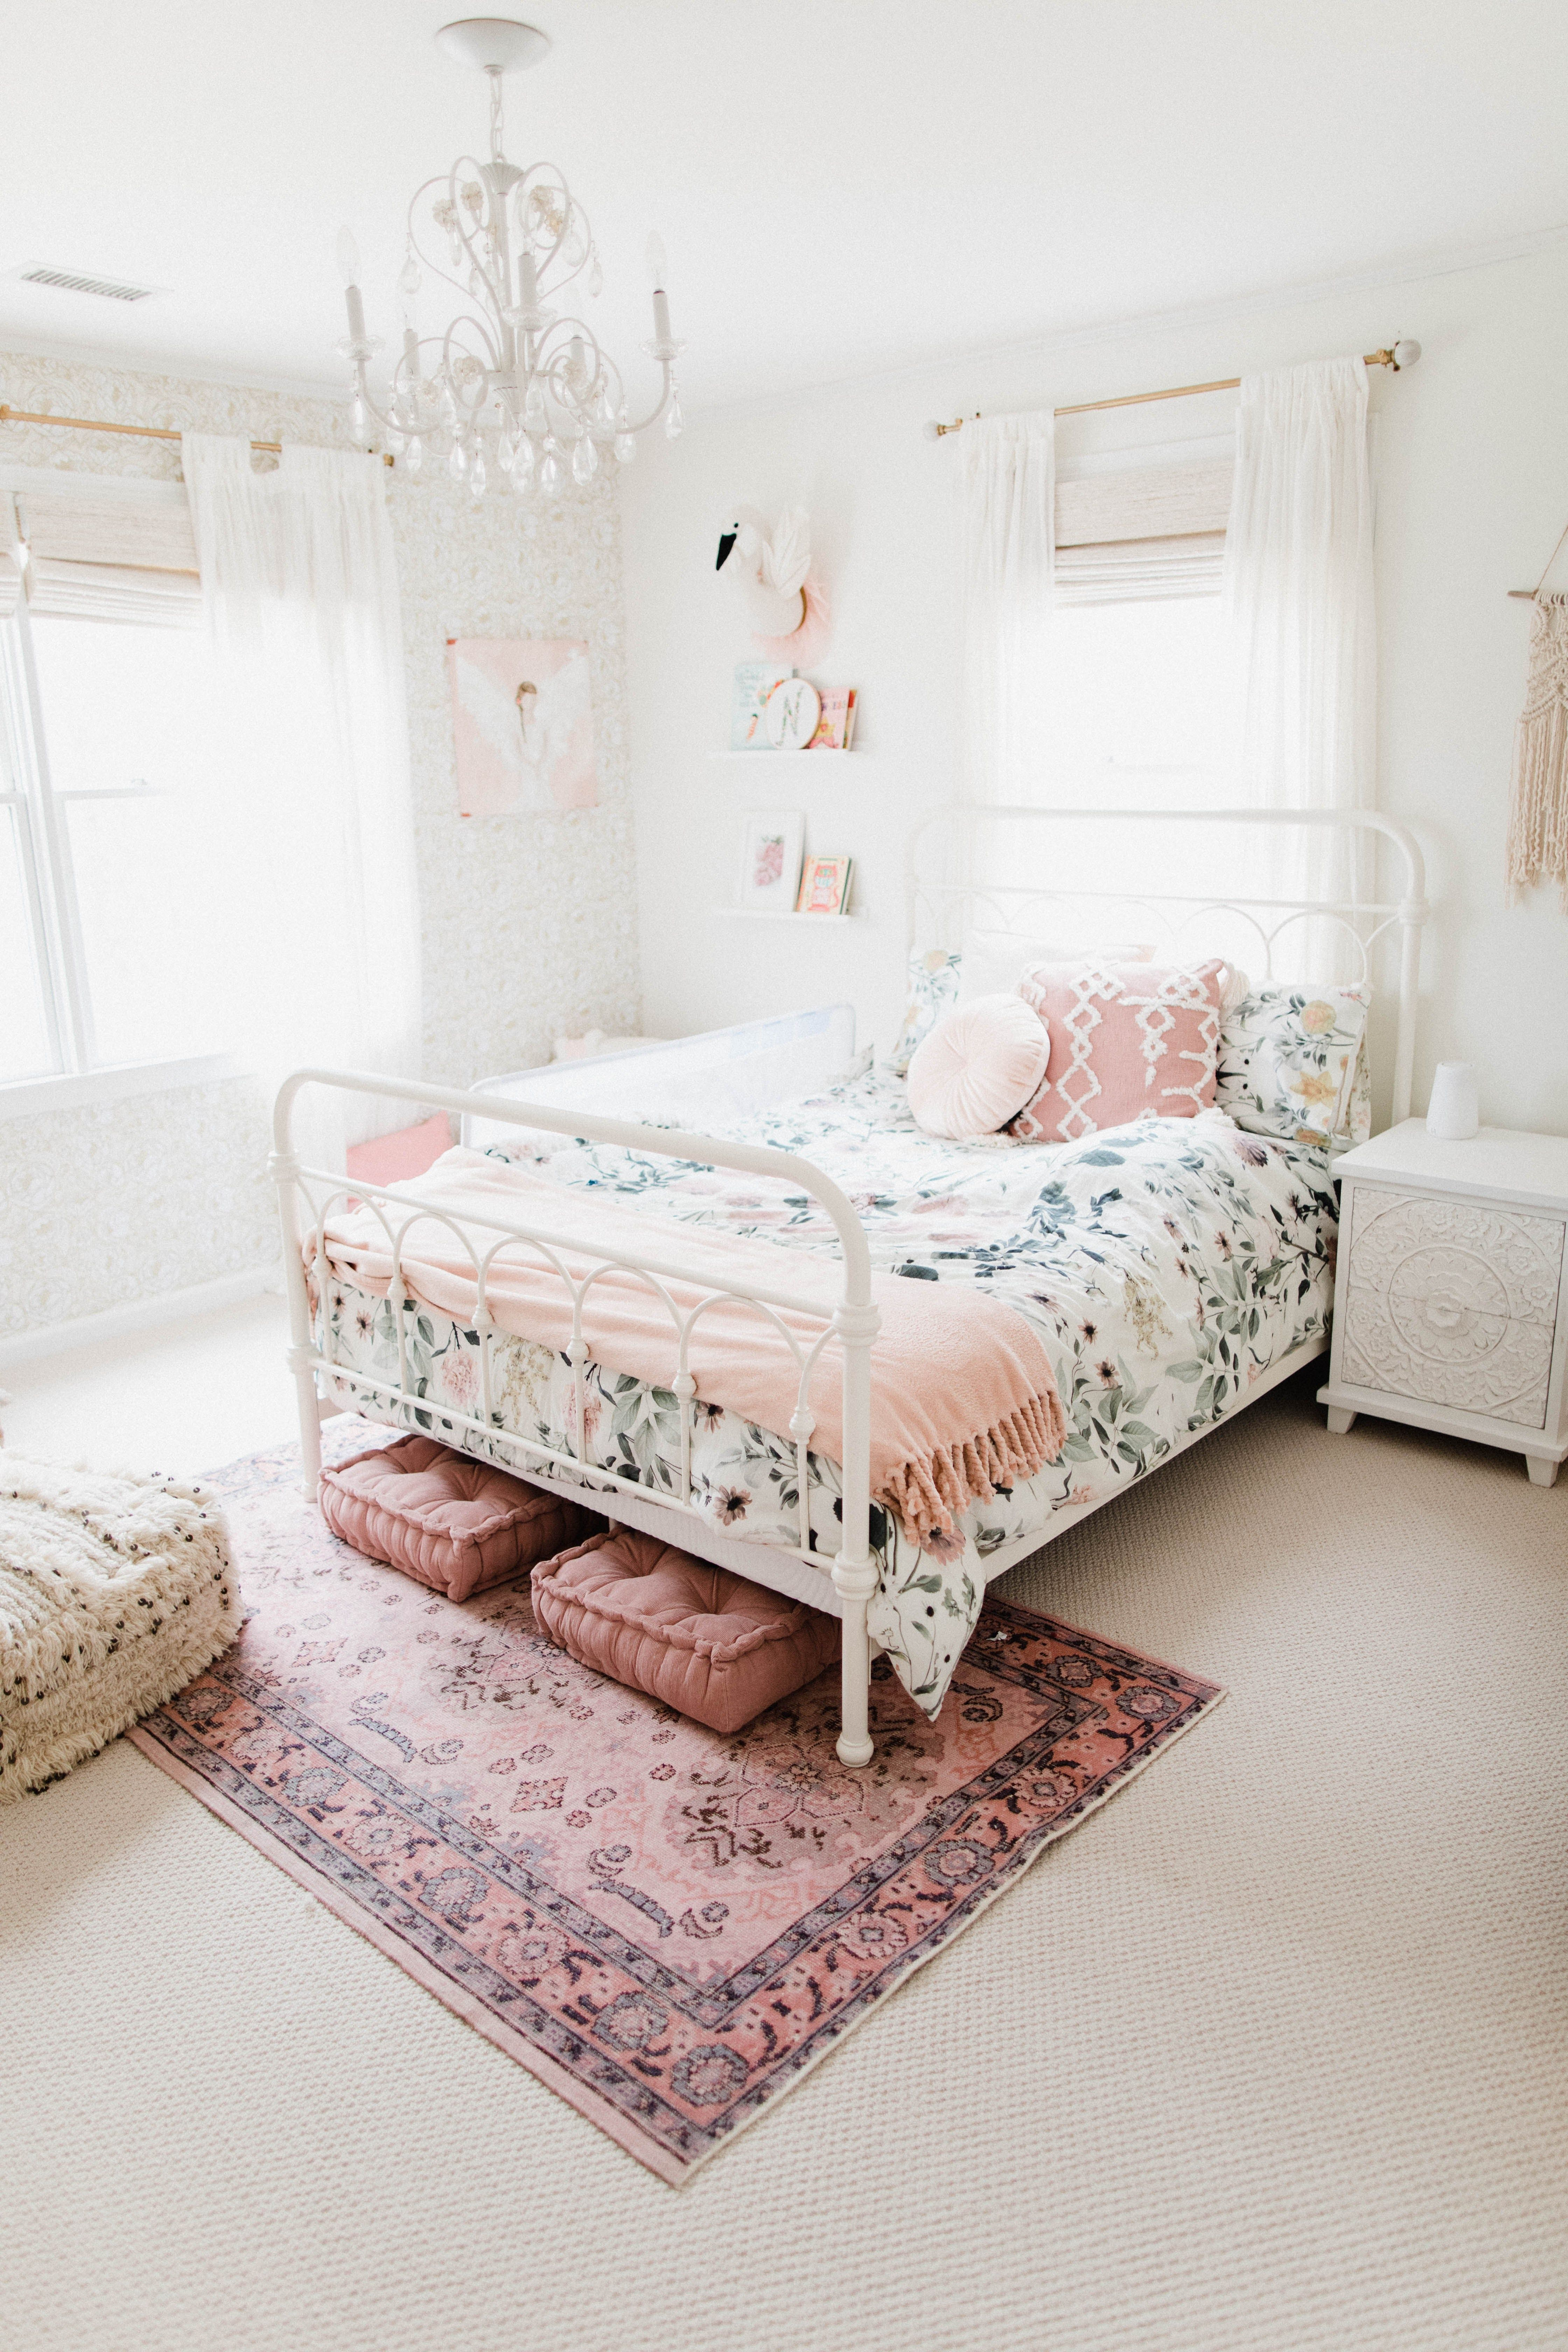 Why We Installed Wall-to-Wall Carpeting Upstairs - Lauren McBride #girlsbedroom